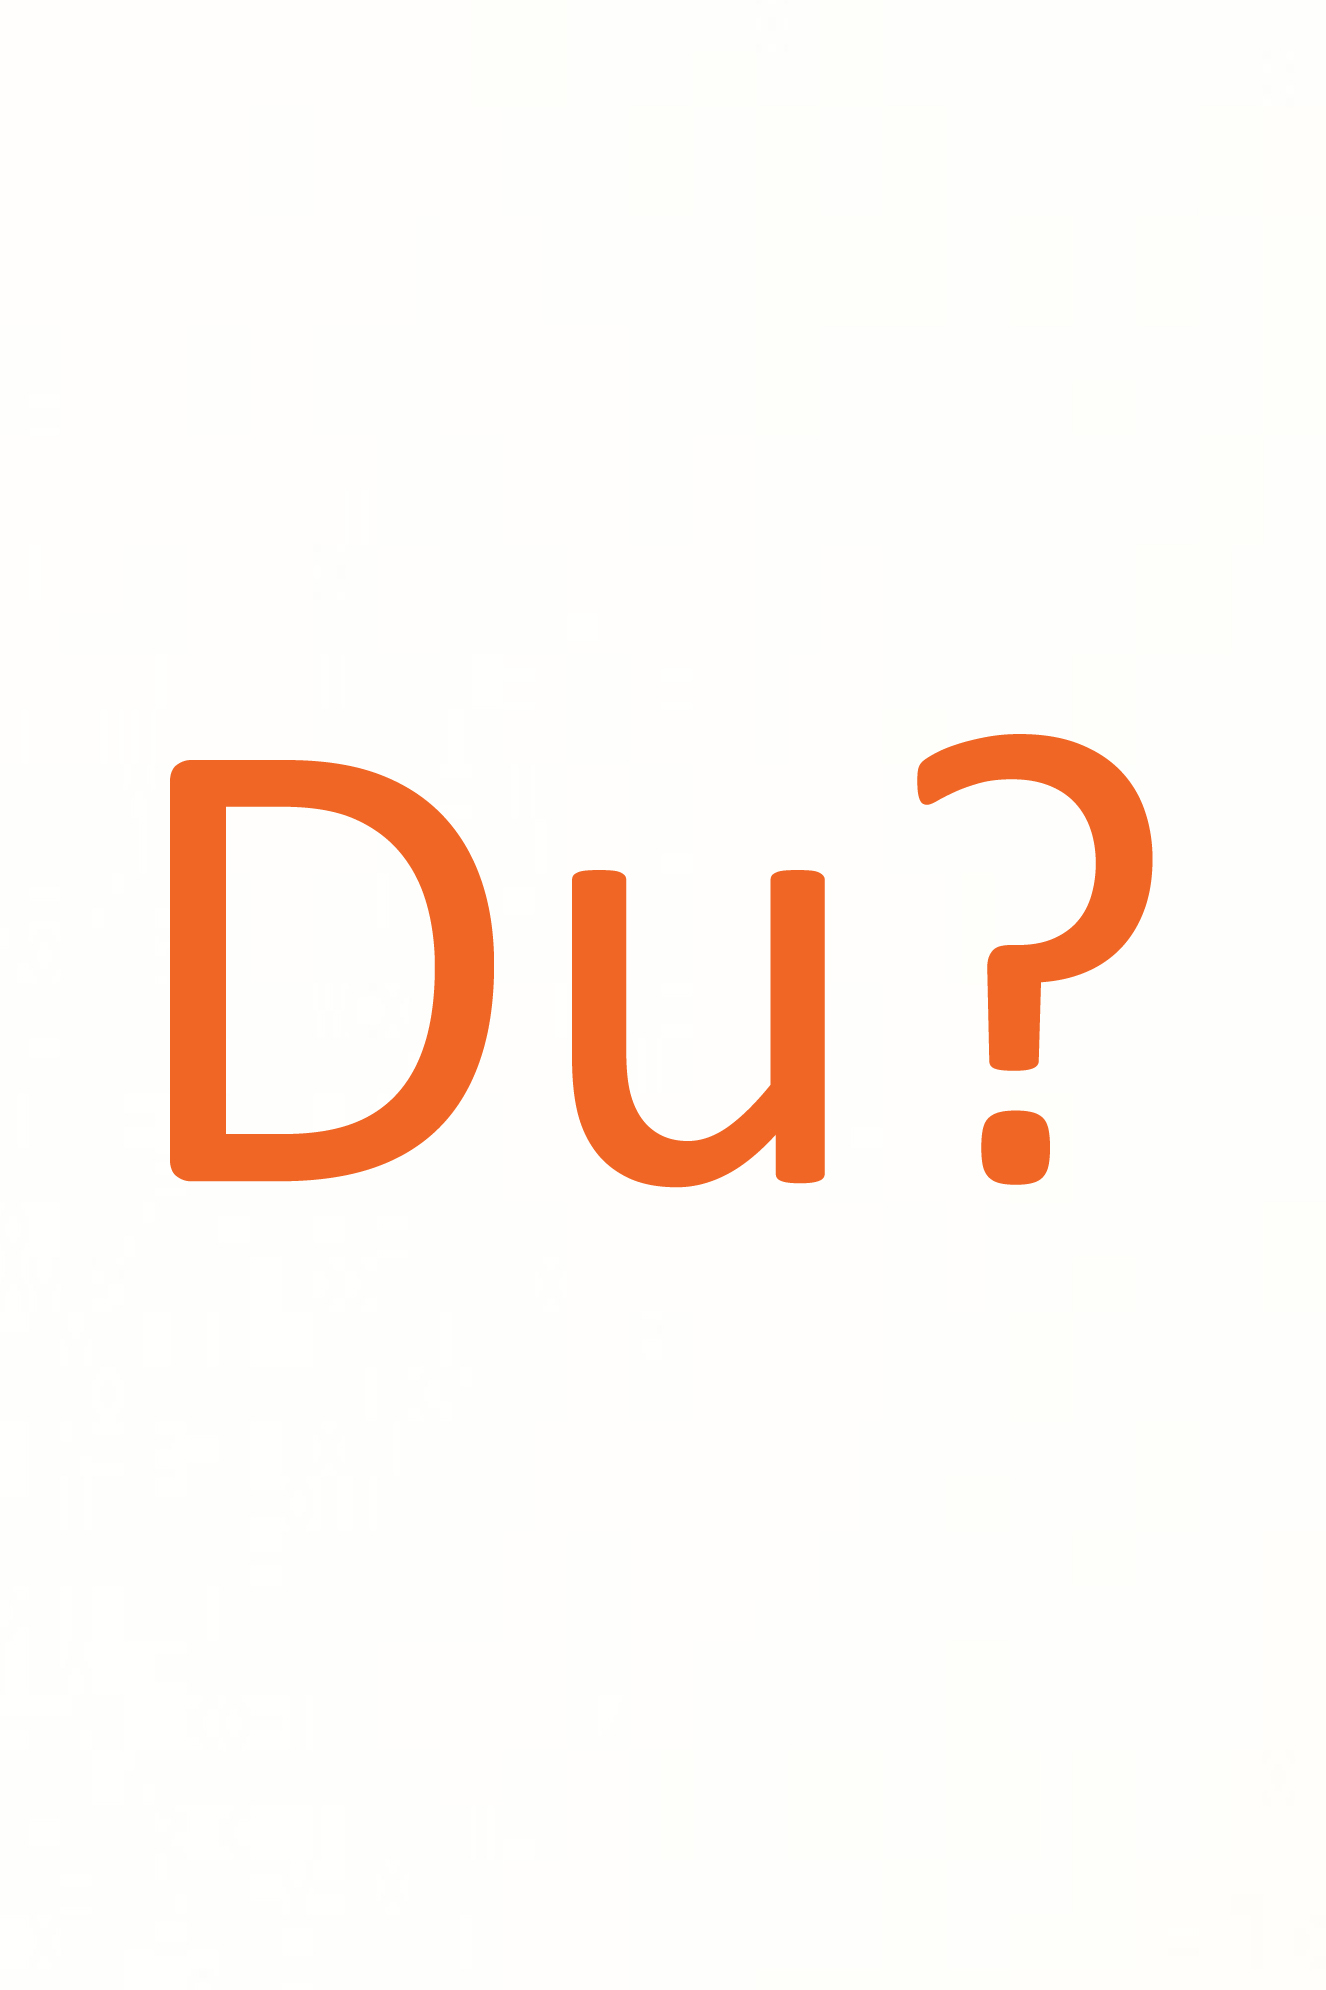 http://www.noonee.com/wp-content/uploads/2018/05/Du.jpg